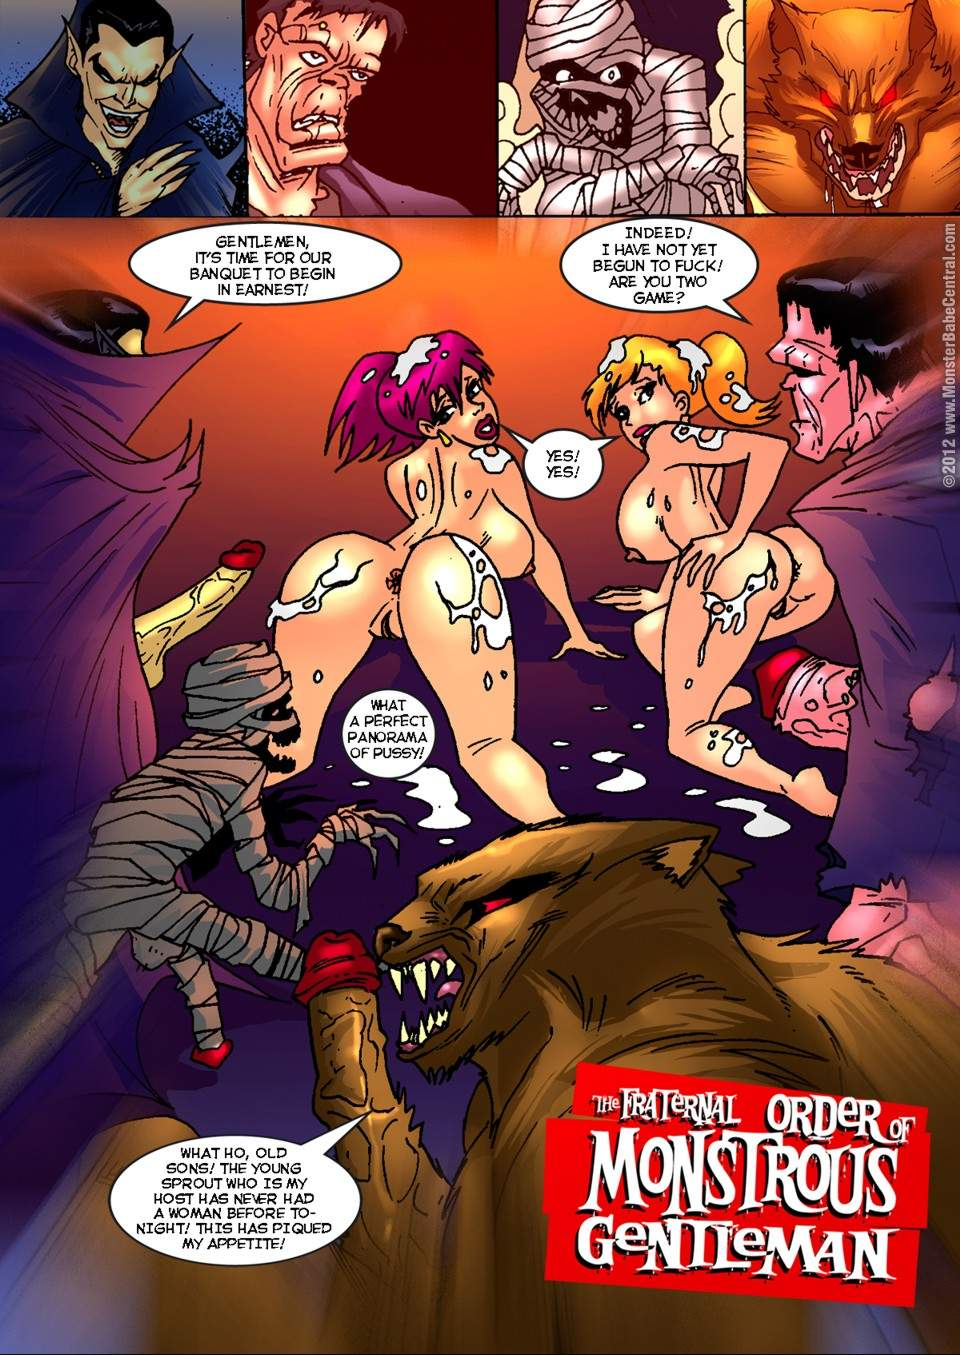 SureFap xxx porno Crossover - [MonsterBabeCentral] - The Fraternal Order of Monstrous Gentlemen! - Issue 4 - Banquet